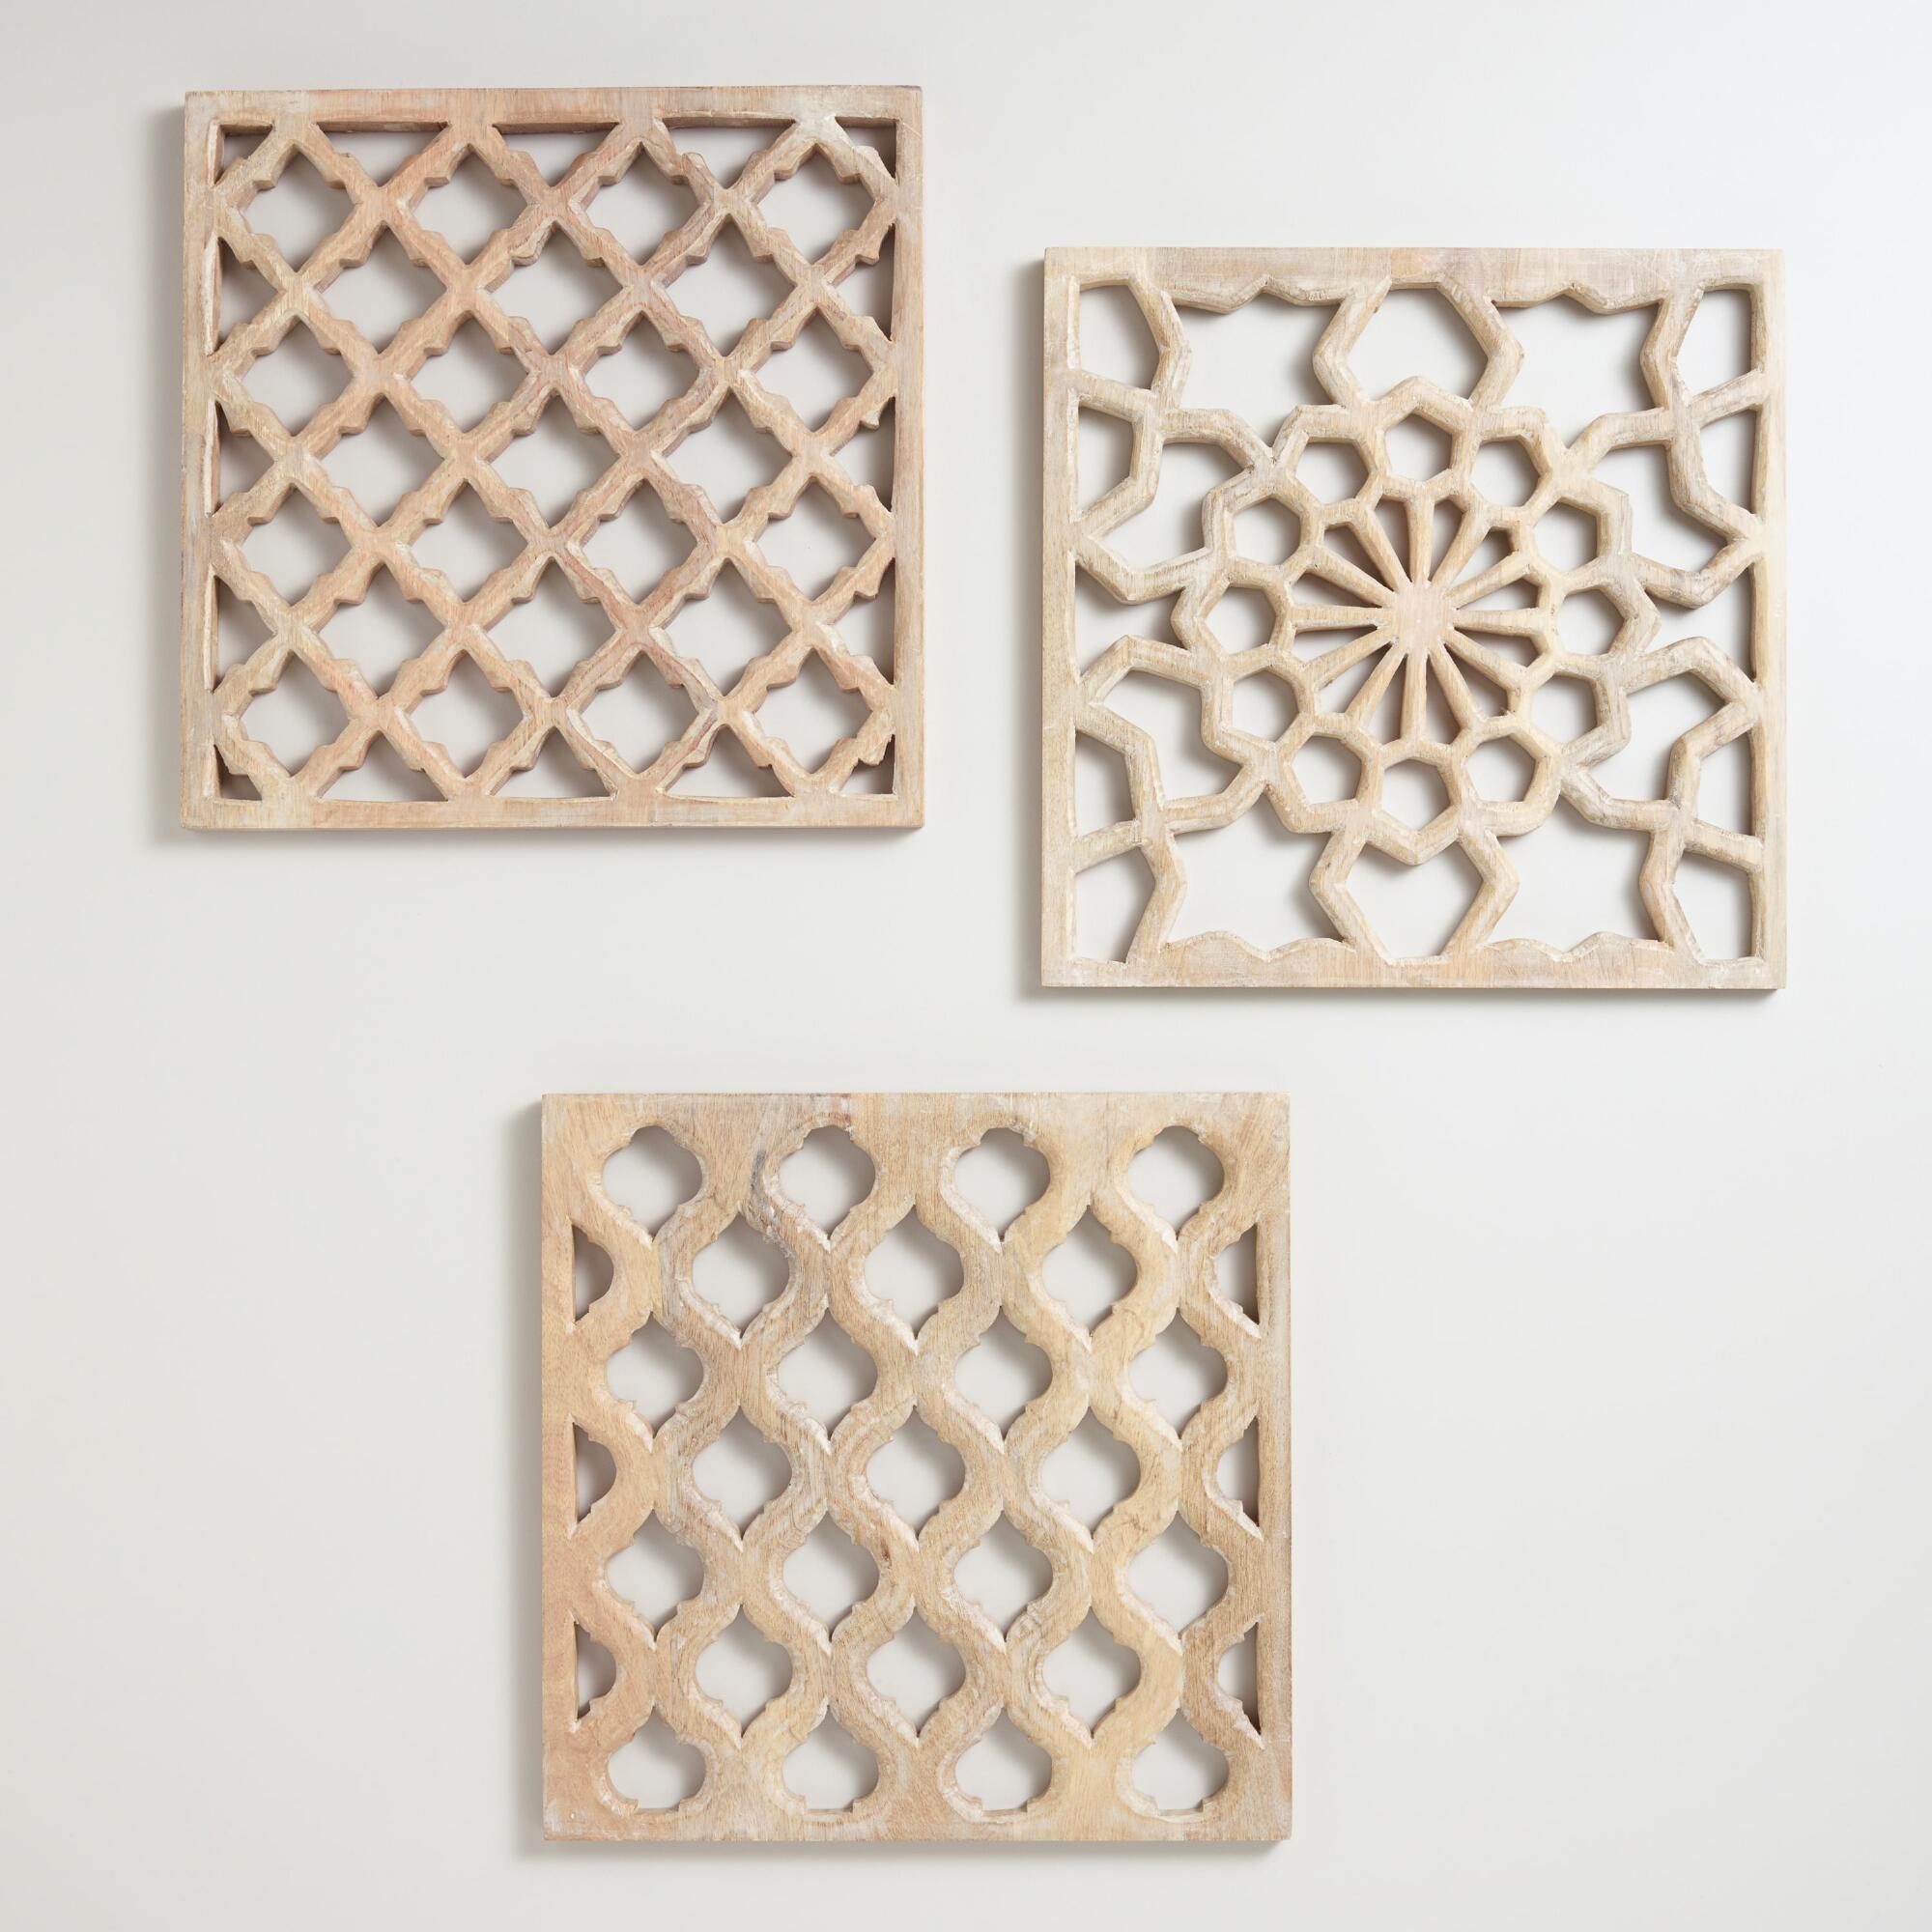 Nathan Carved Wood Wall Panels Set Of 3 World Market Regarding World Market Wall Art (View 7 of 20)